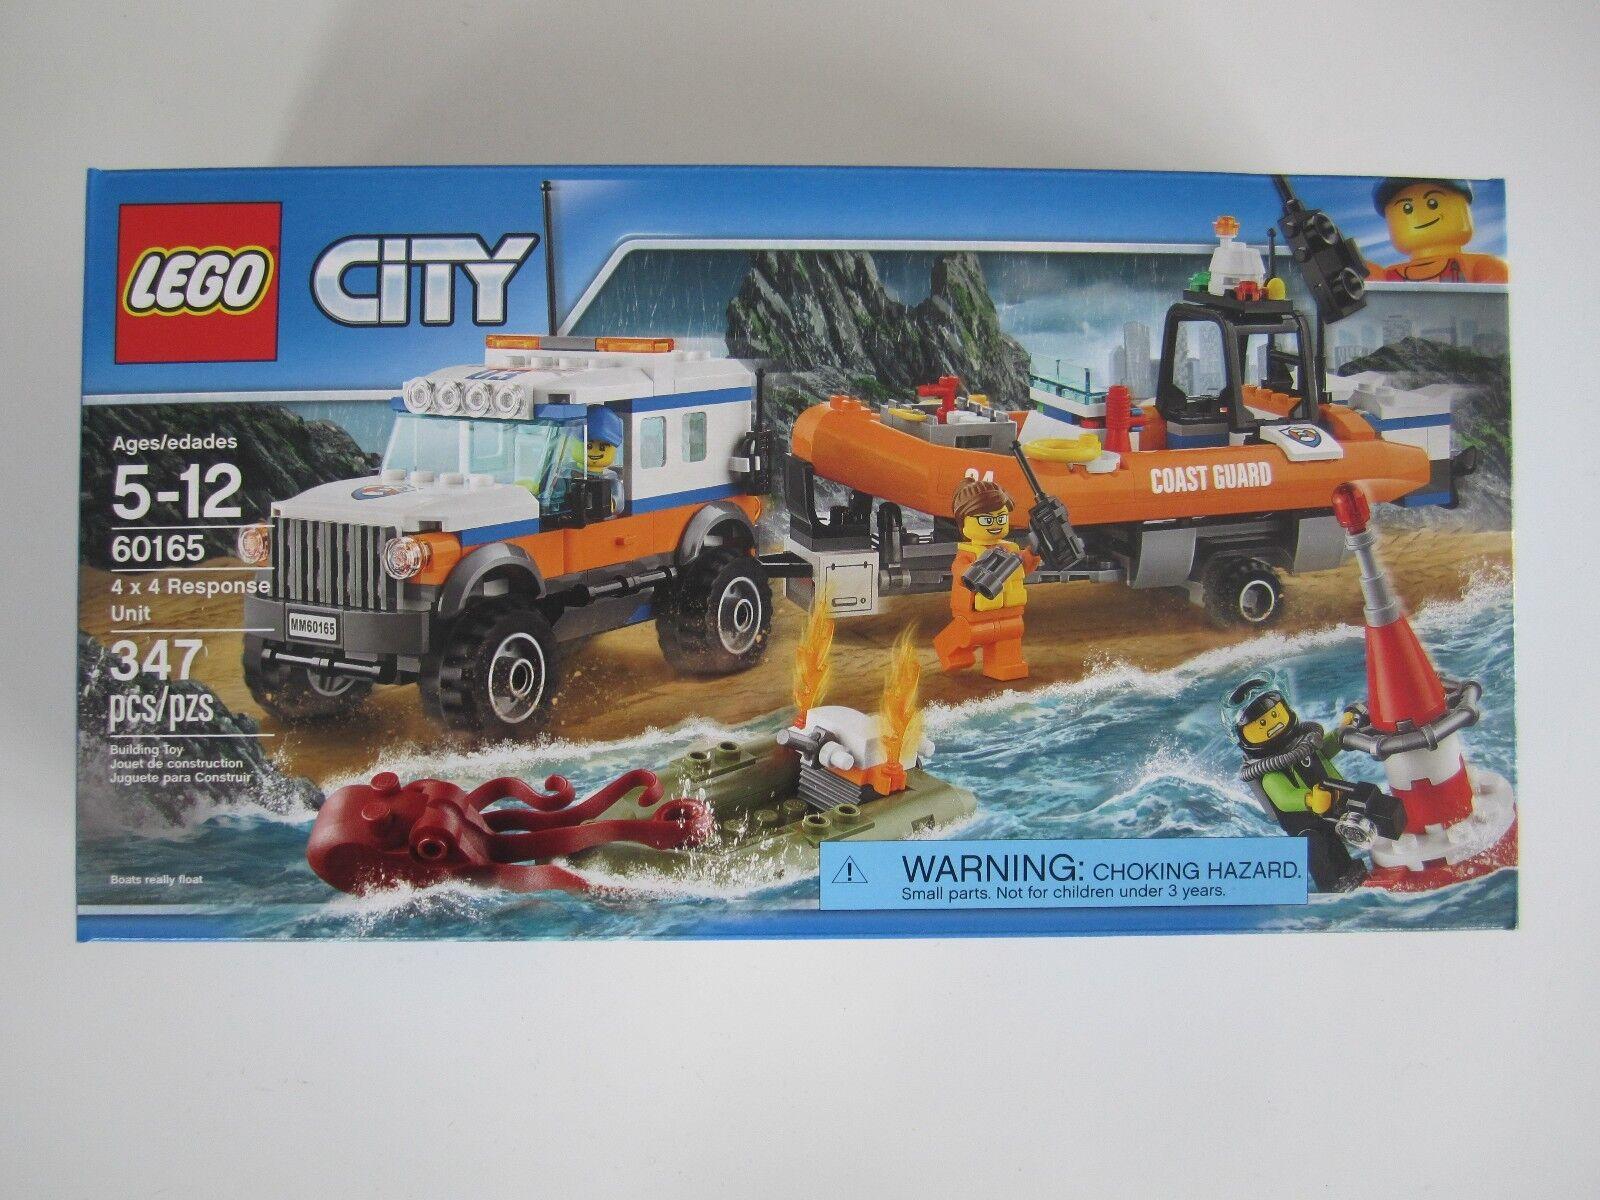 60165 LEGO City 4 x 4 Coast Guard Response Unit Factory Sealed New in Box